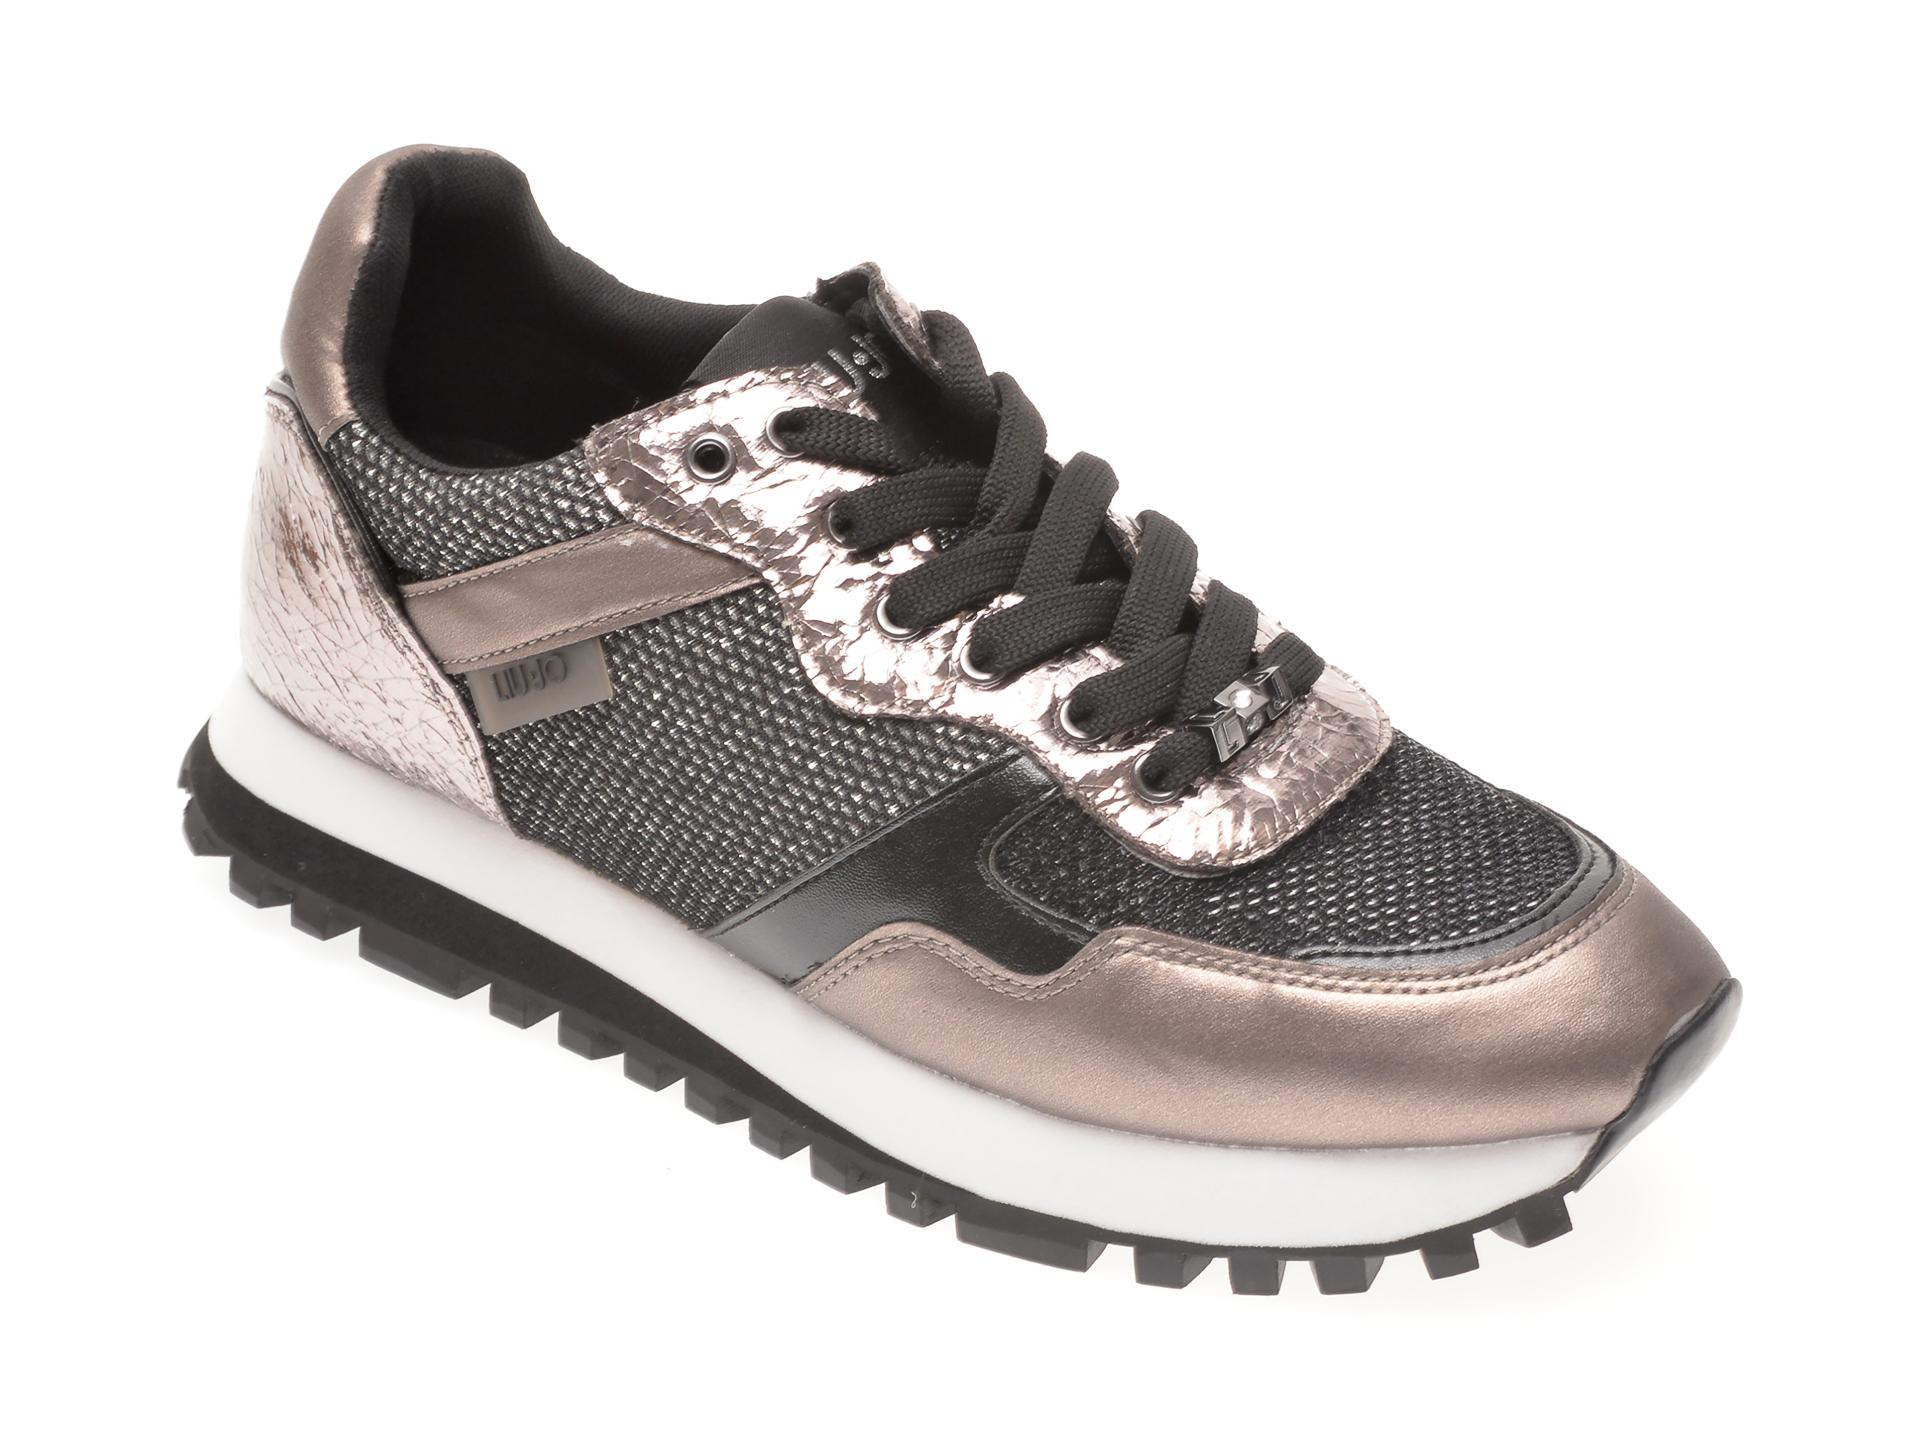 Pantofi sport LIU JO gri, WONDER, din material textil si piele ecologica